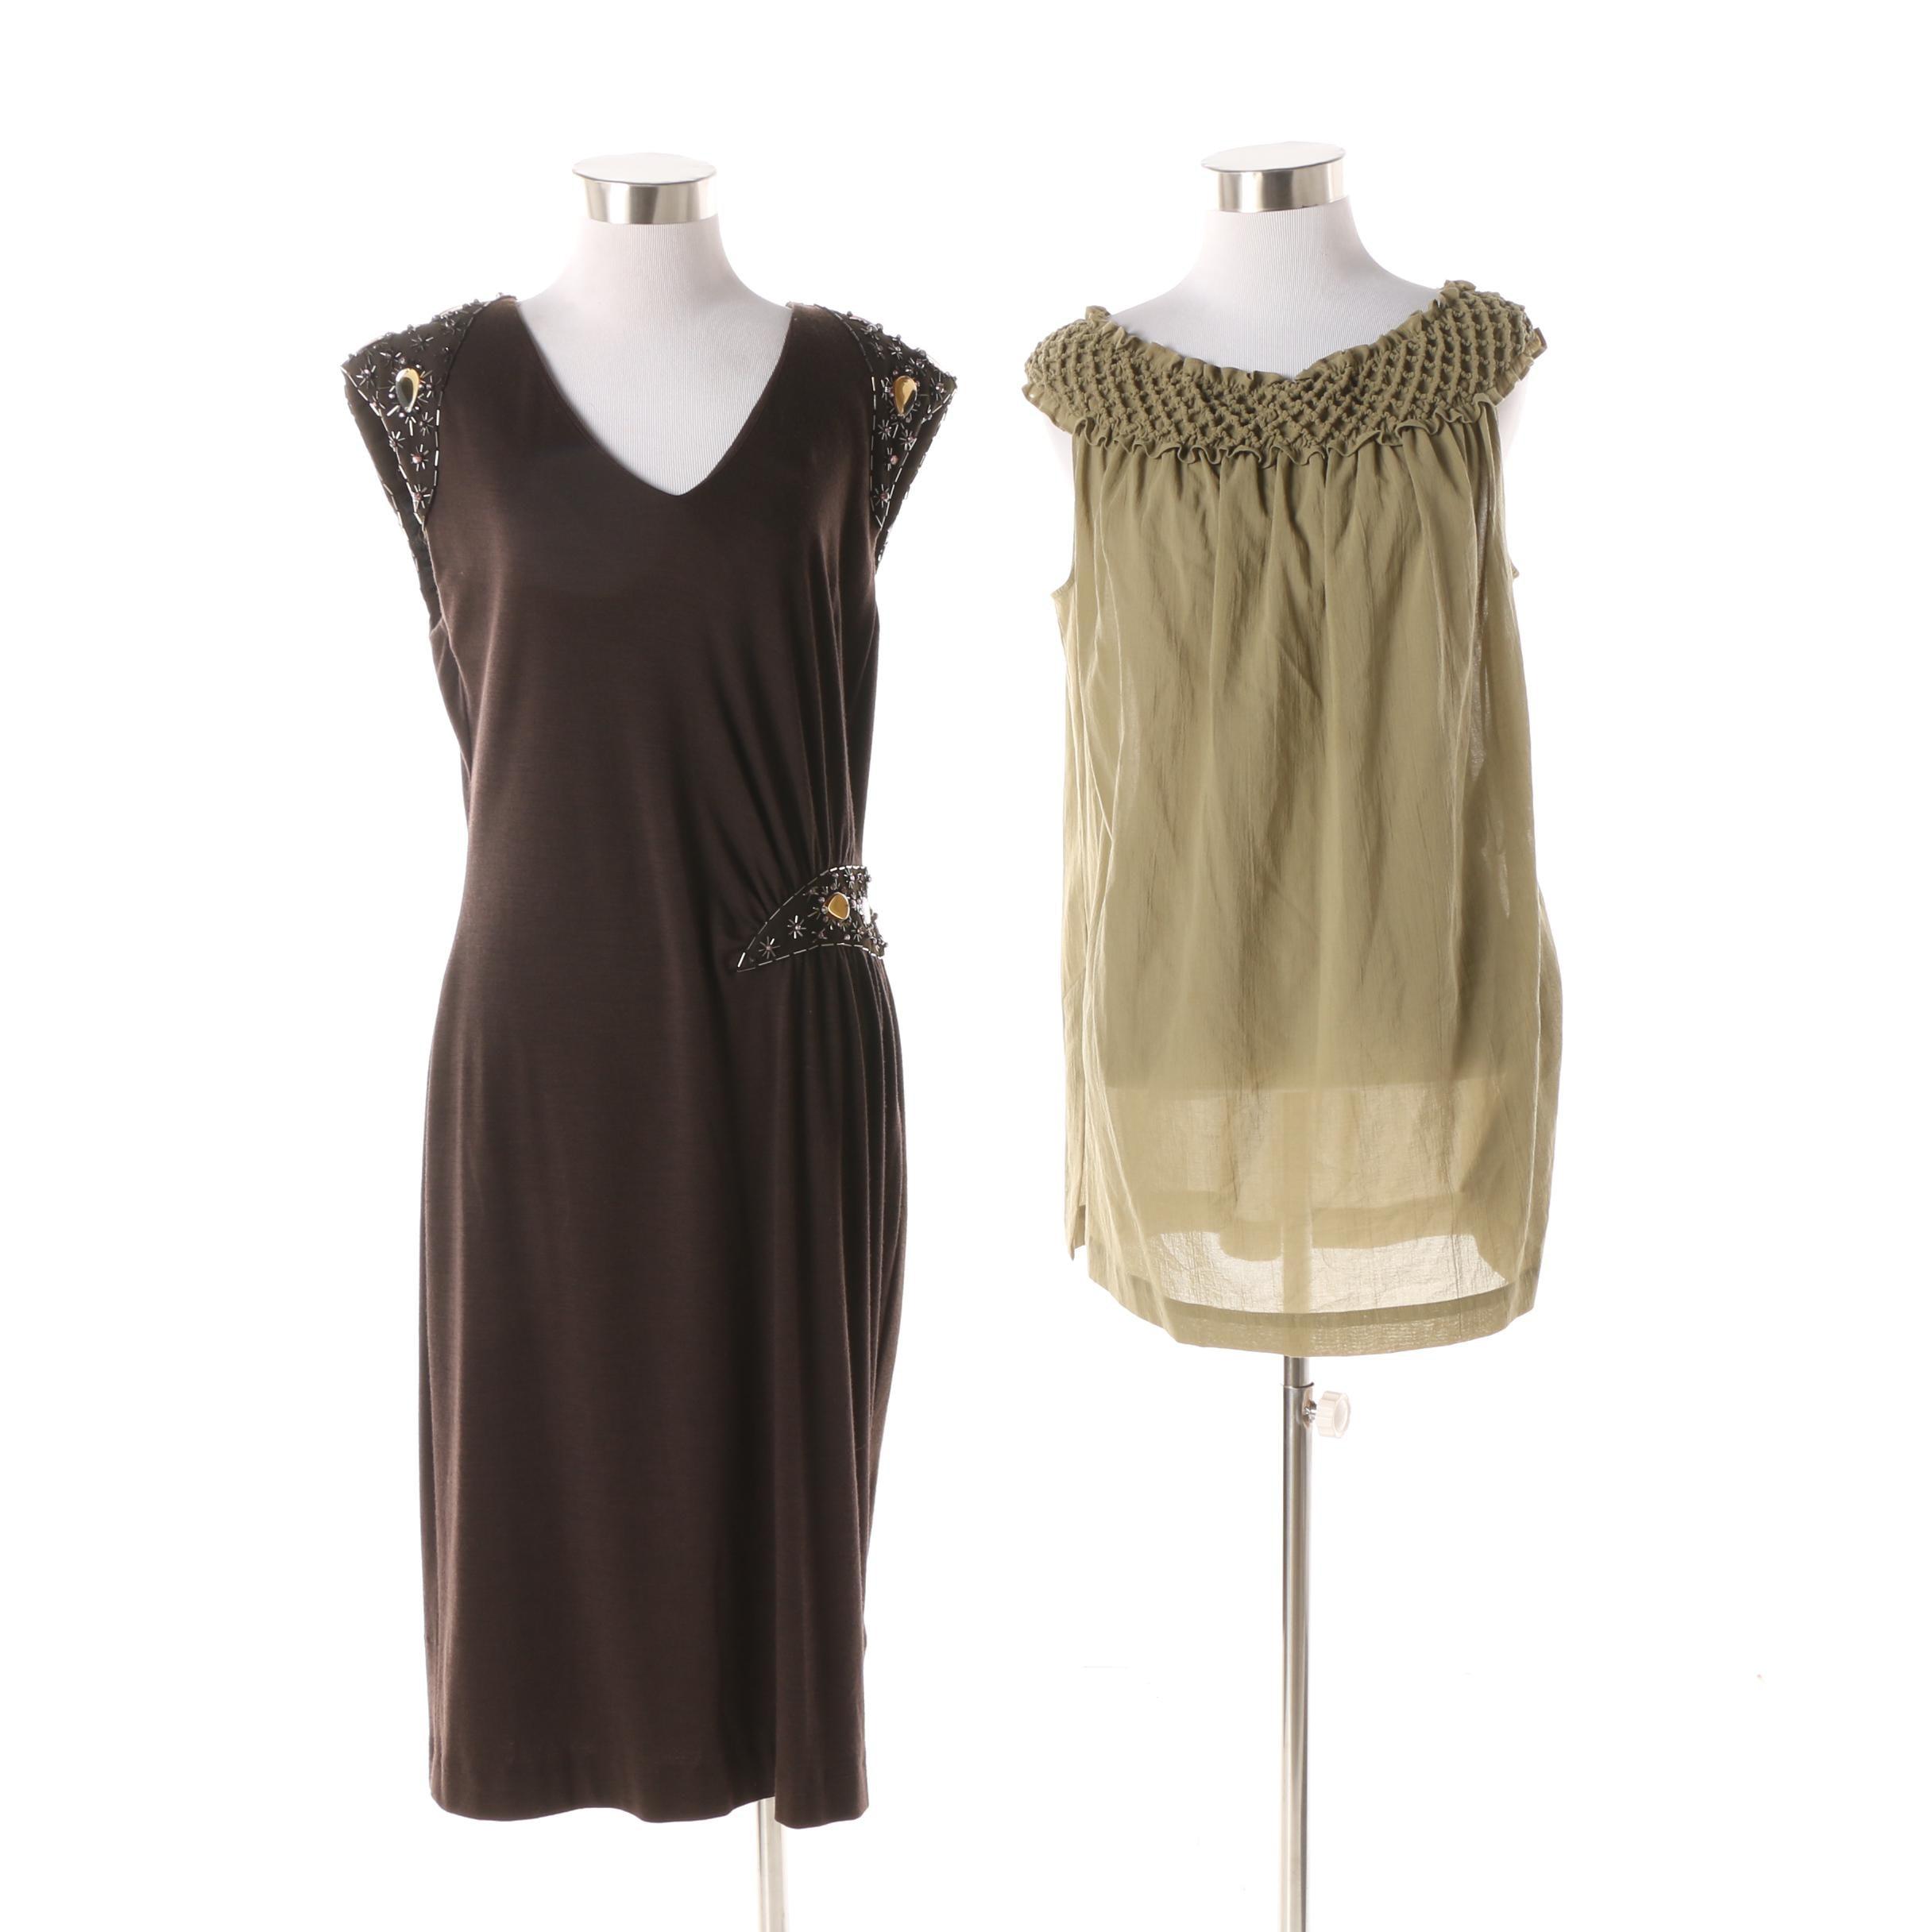 Escada Beaded Sleeveless Dress and Tunic Top